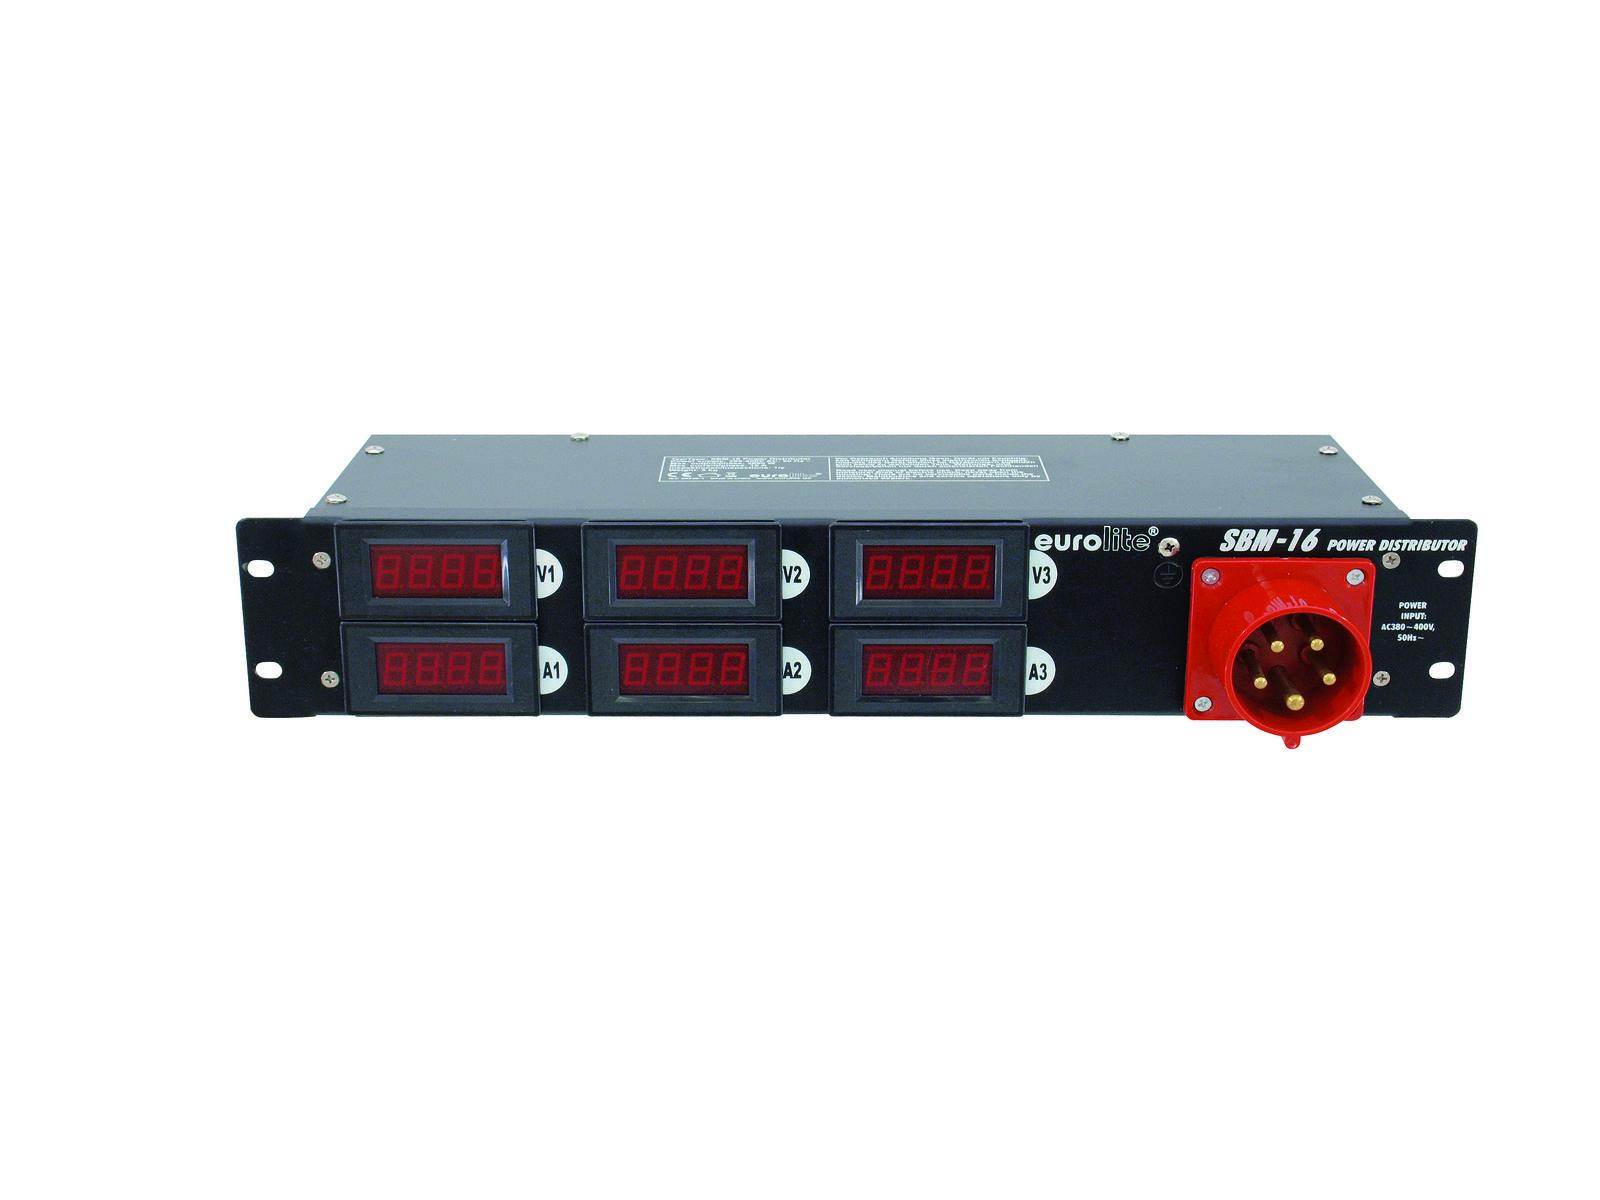 EUROLITE SBM-16 Distributor 16A